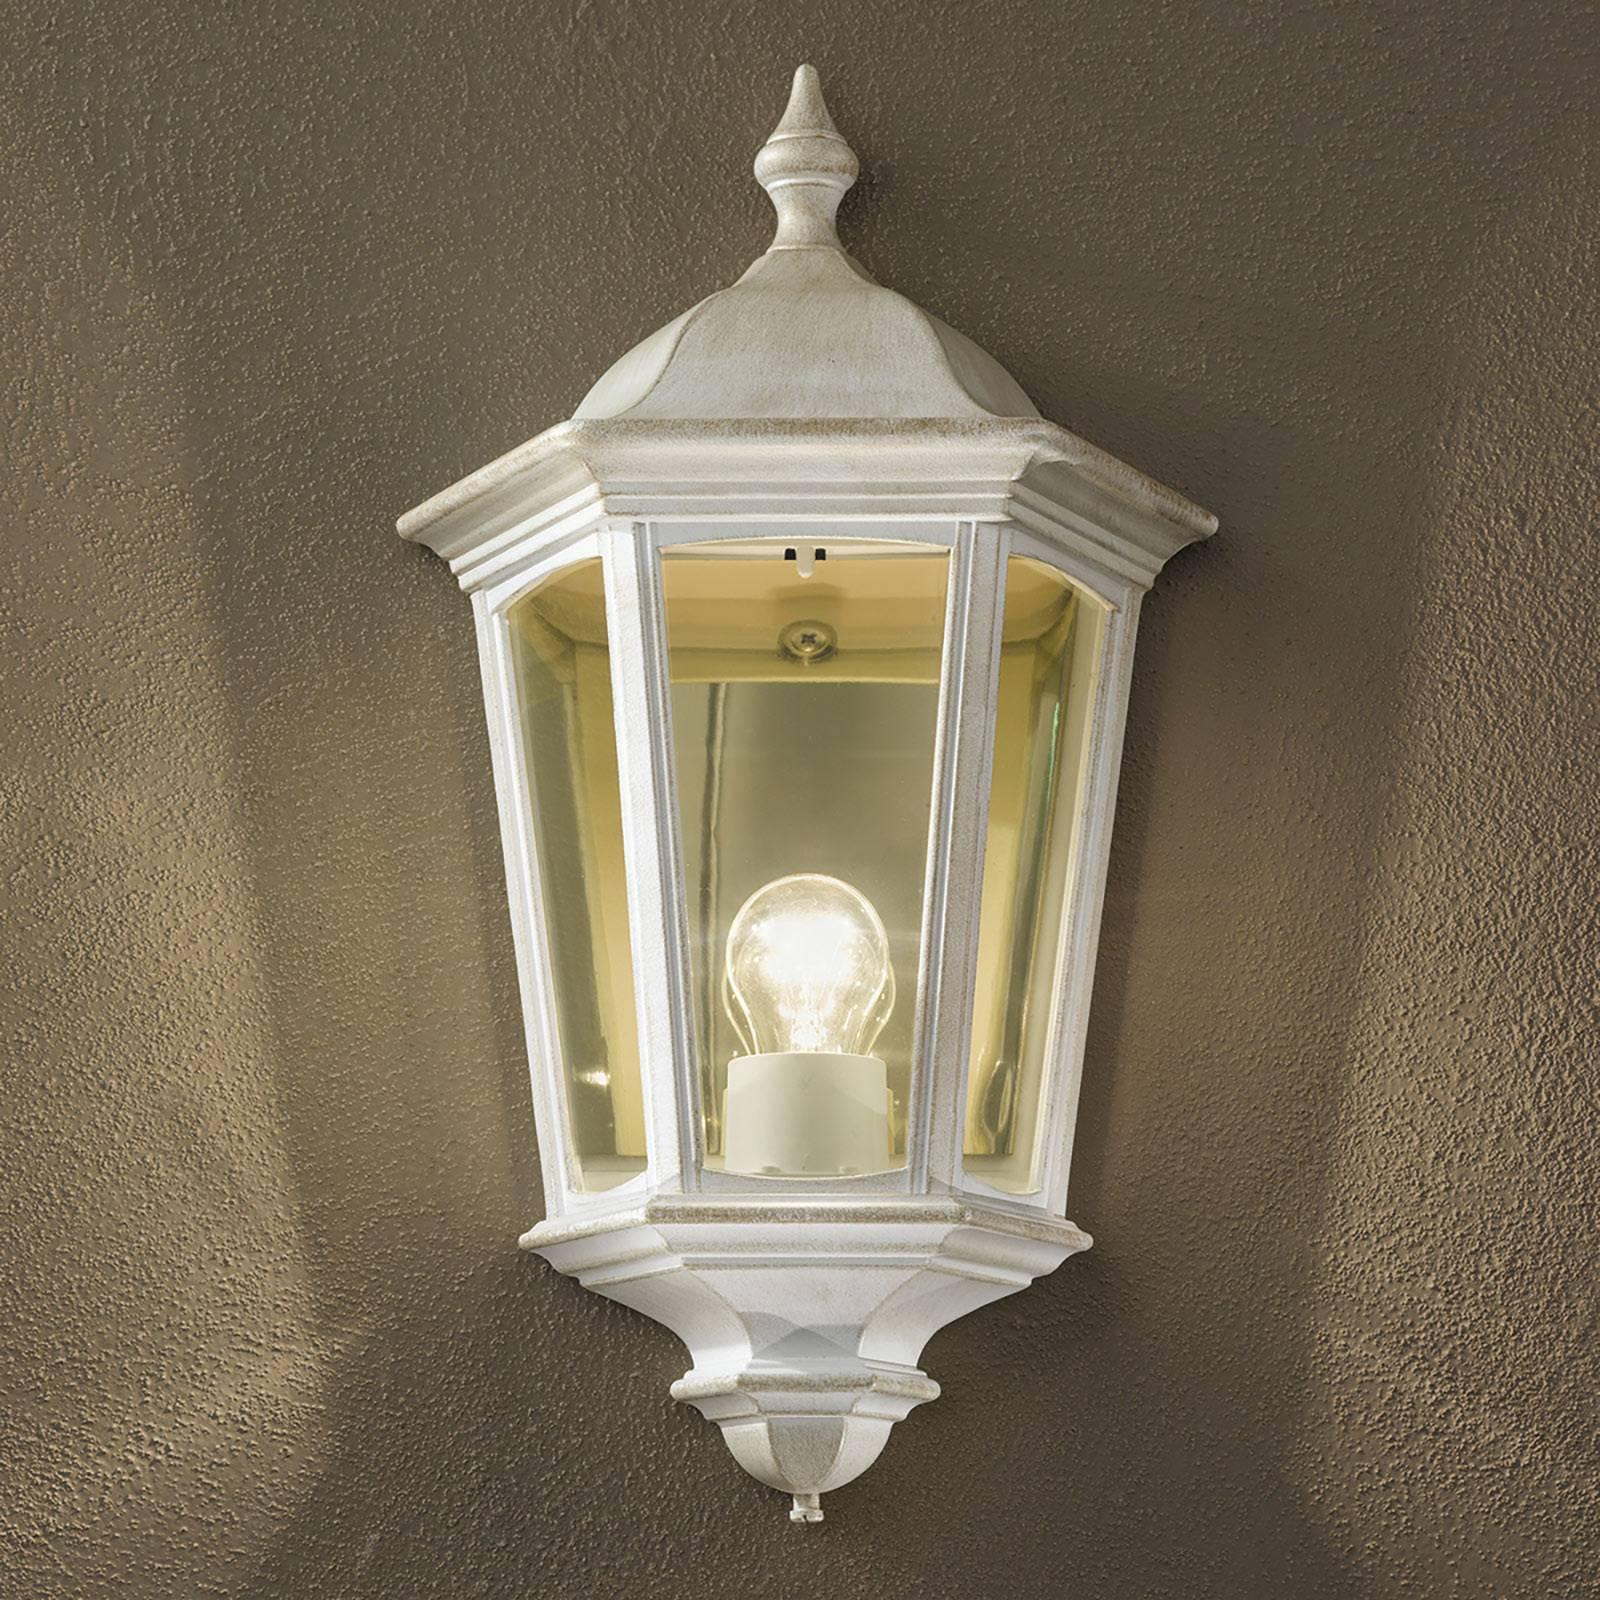 Buitenwandlamp Puchberg, direct, wit-goud